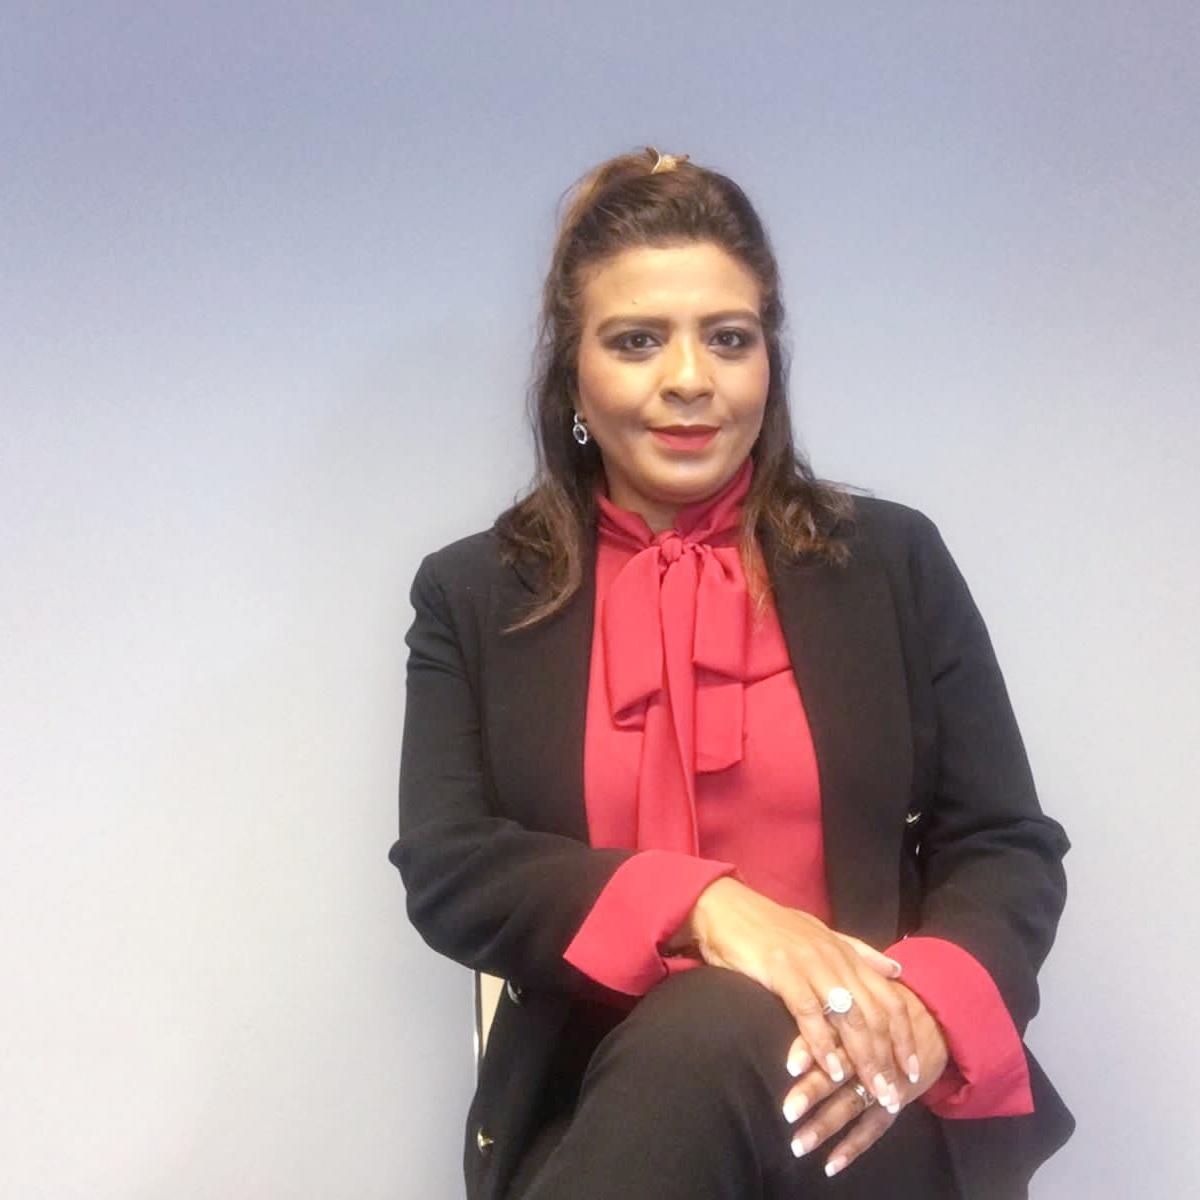 Image of Theresa Naidoo